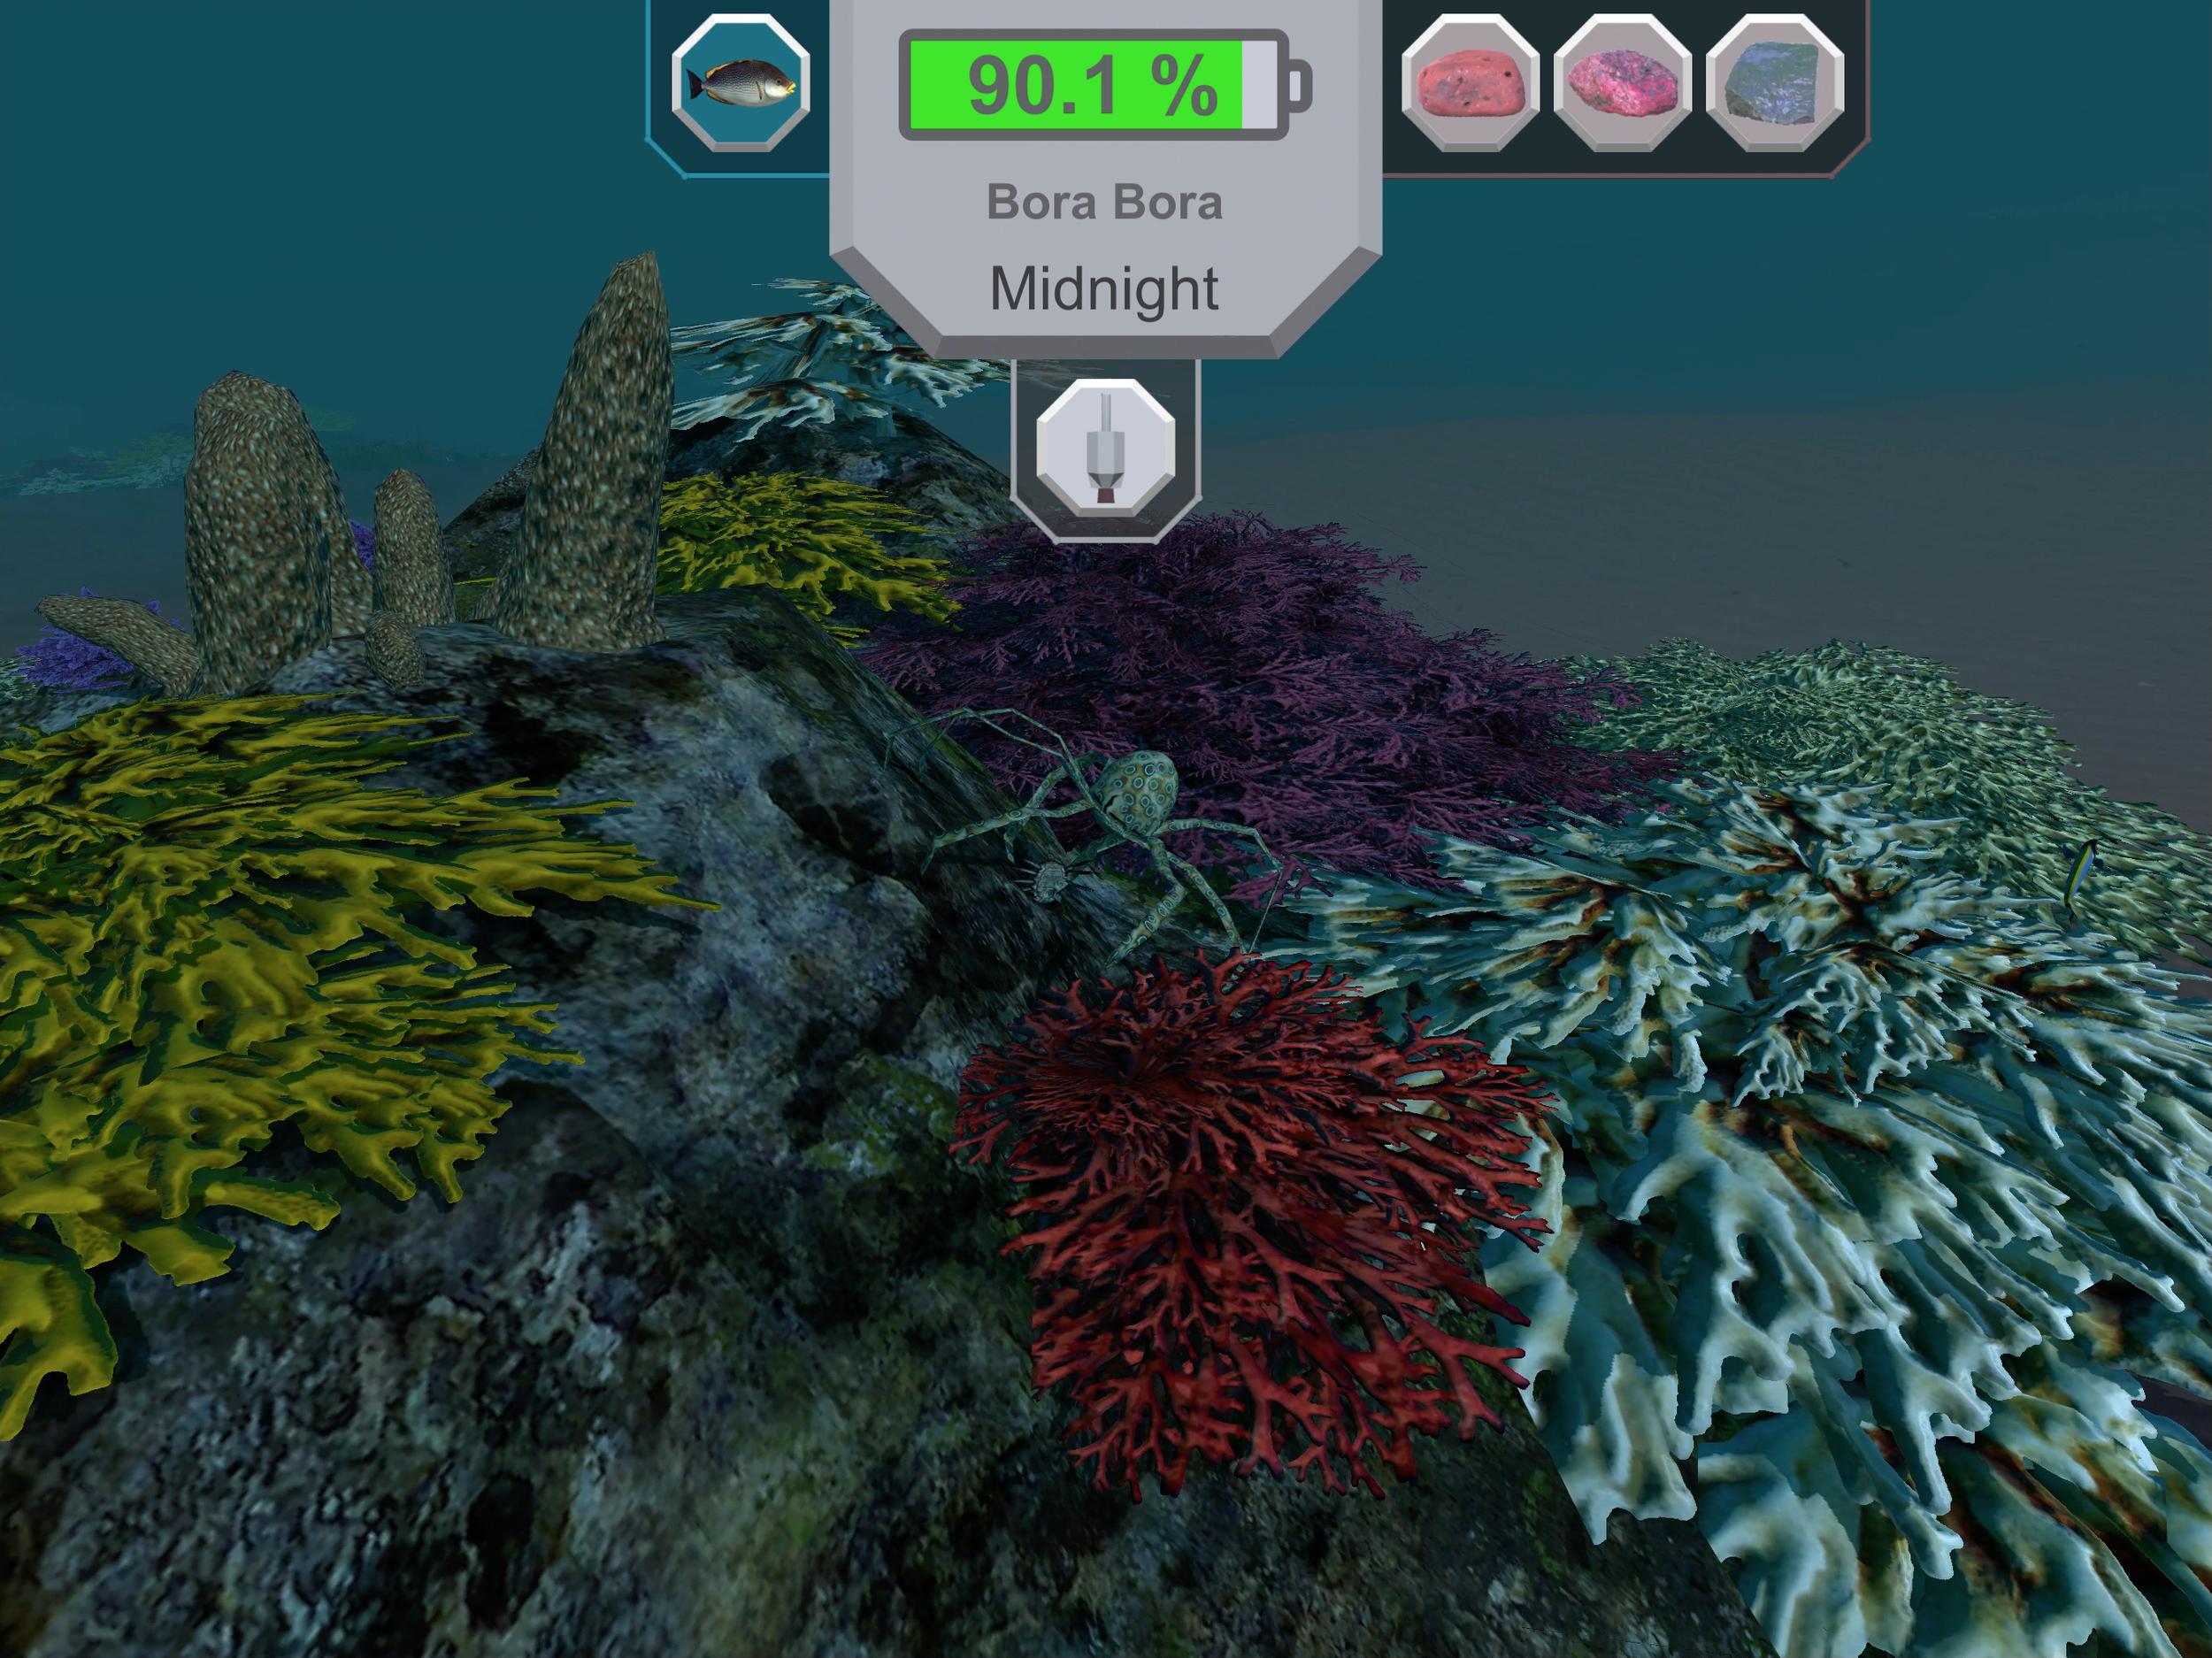 Robocto - Location: Bora Bora (crawling and catching a crab) - iPad